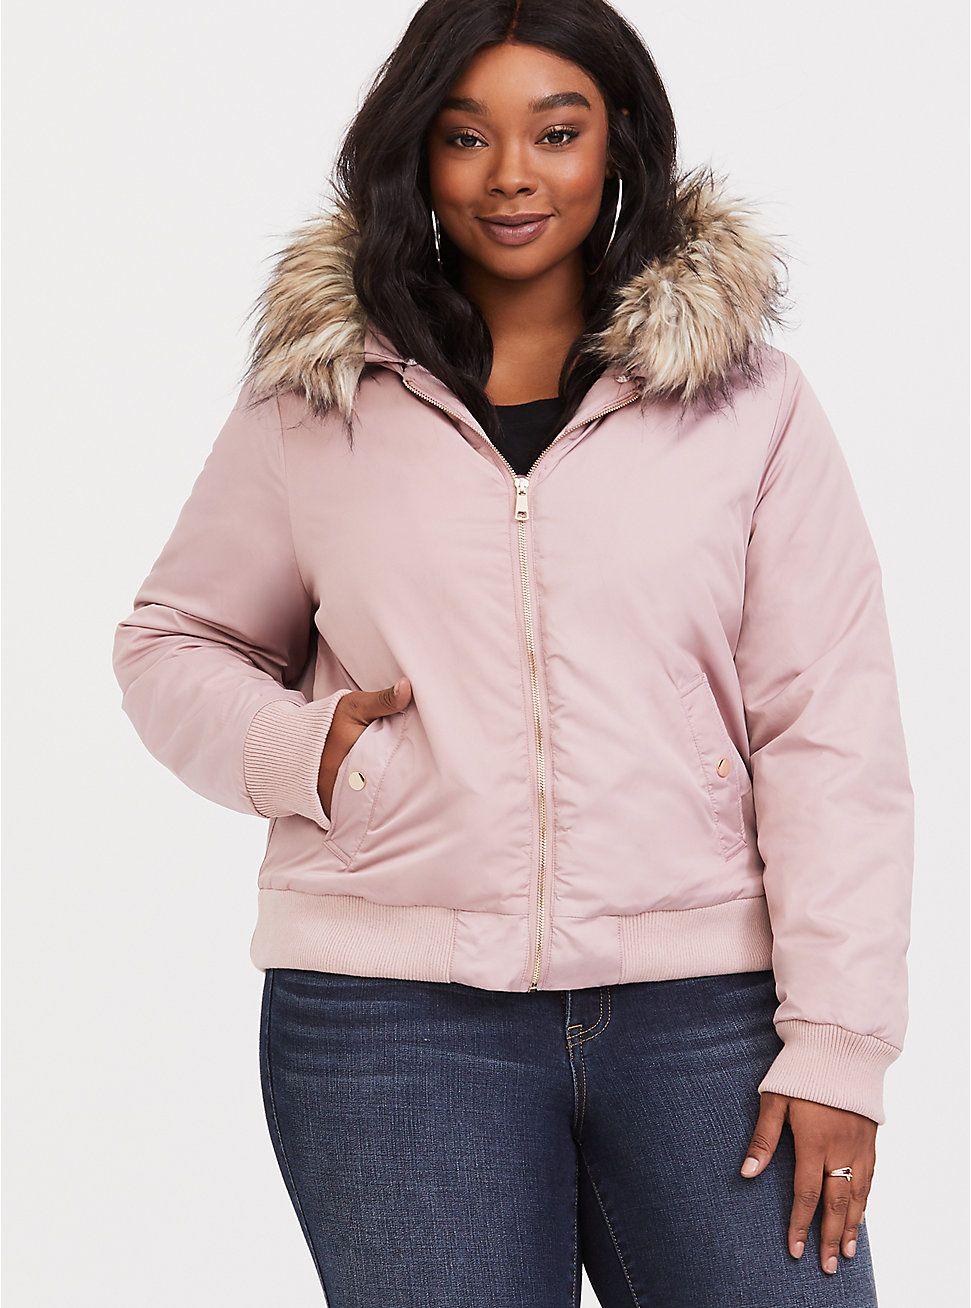 dee1cc4b7e3 Pink Faux Fur Hoodie Bomber Jacket